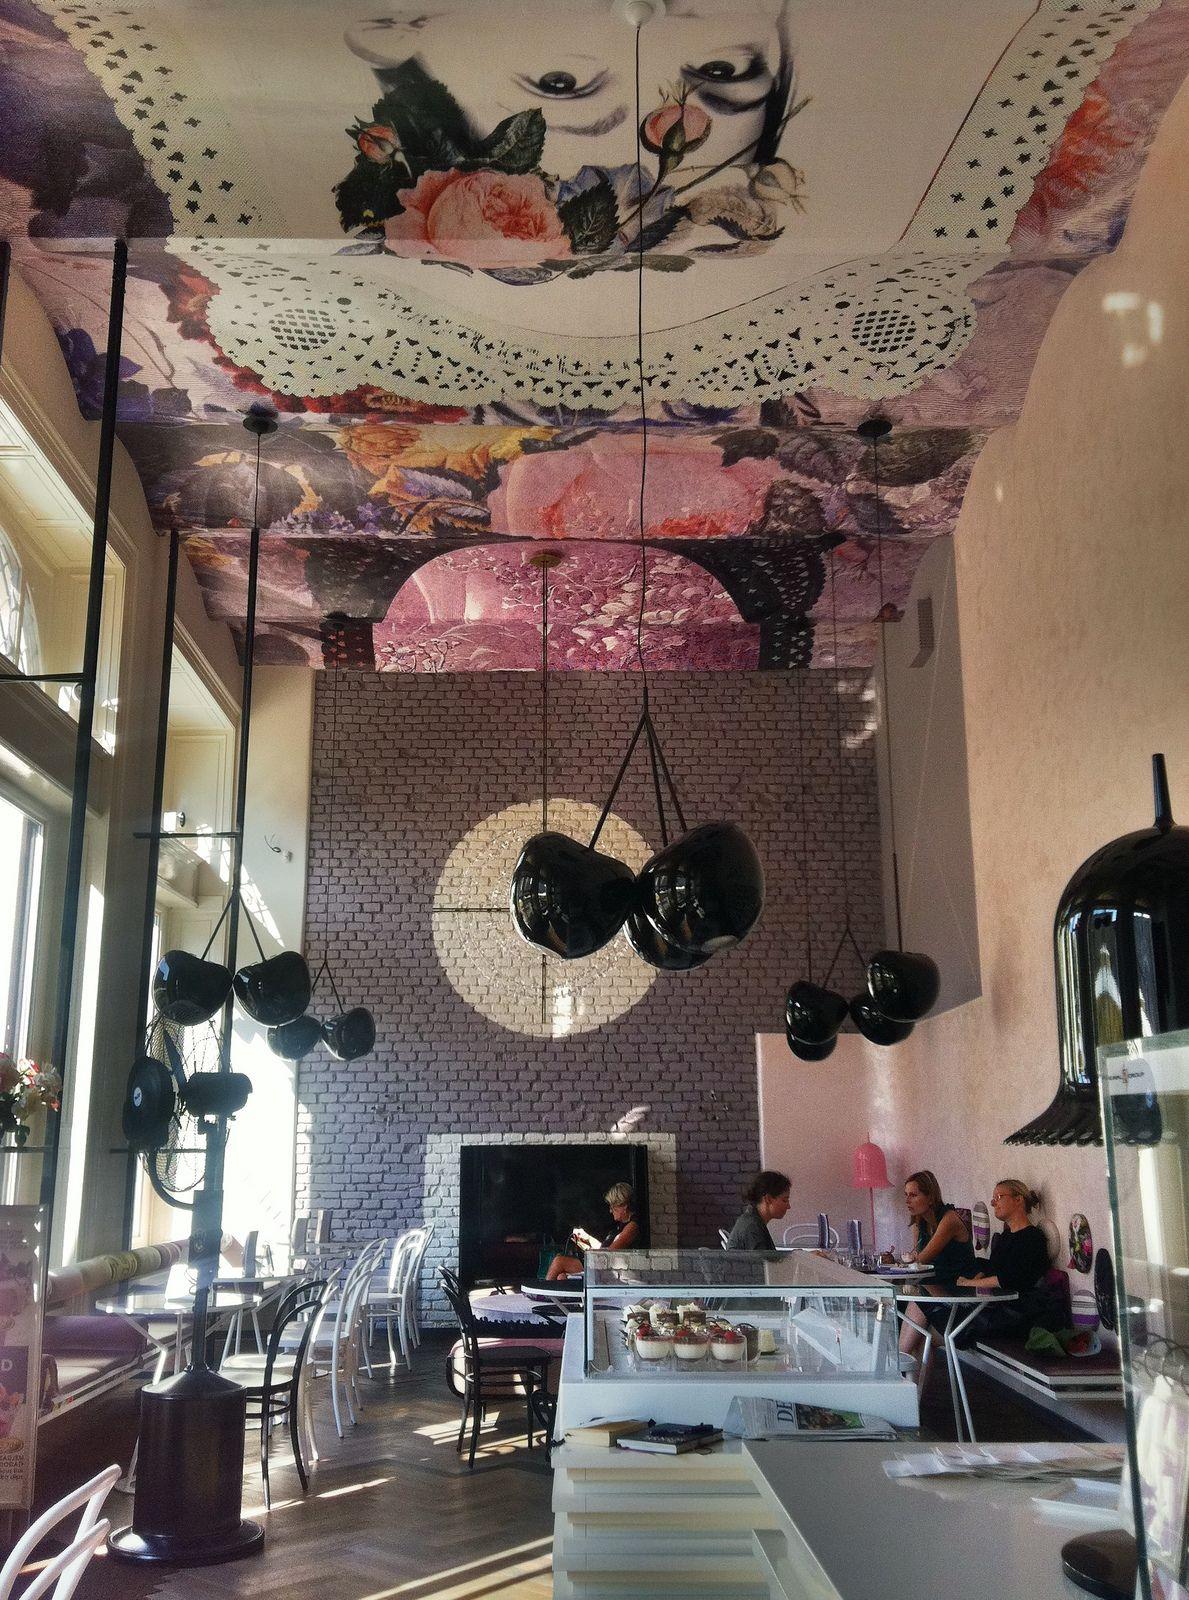 lolita restaurant Ljubljana 03